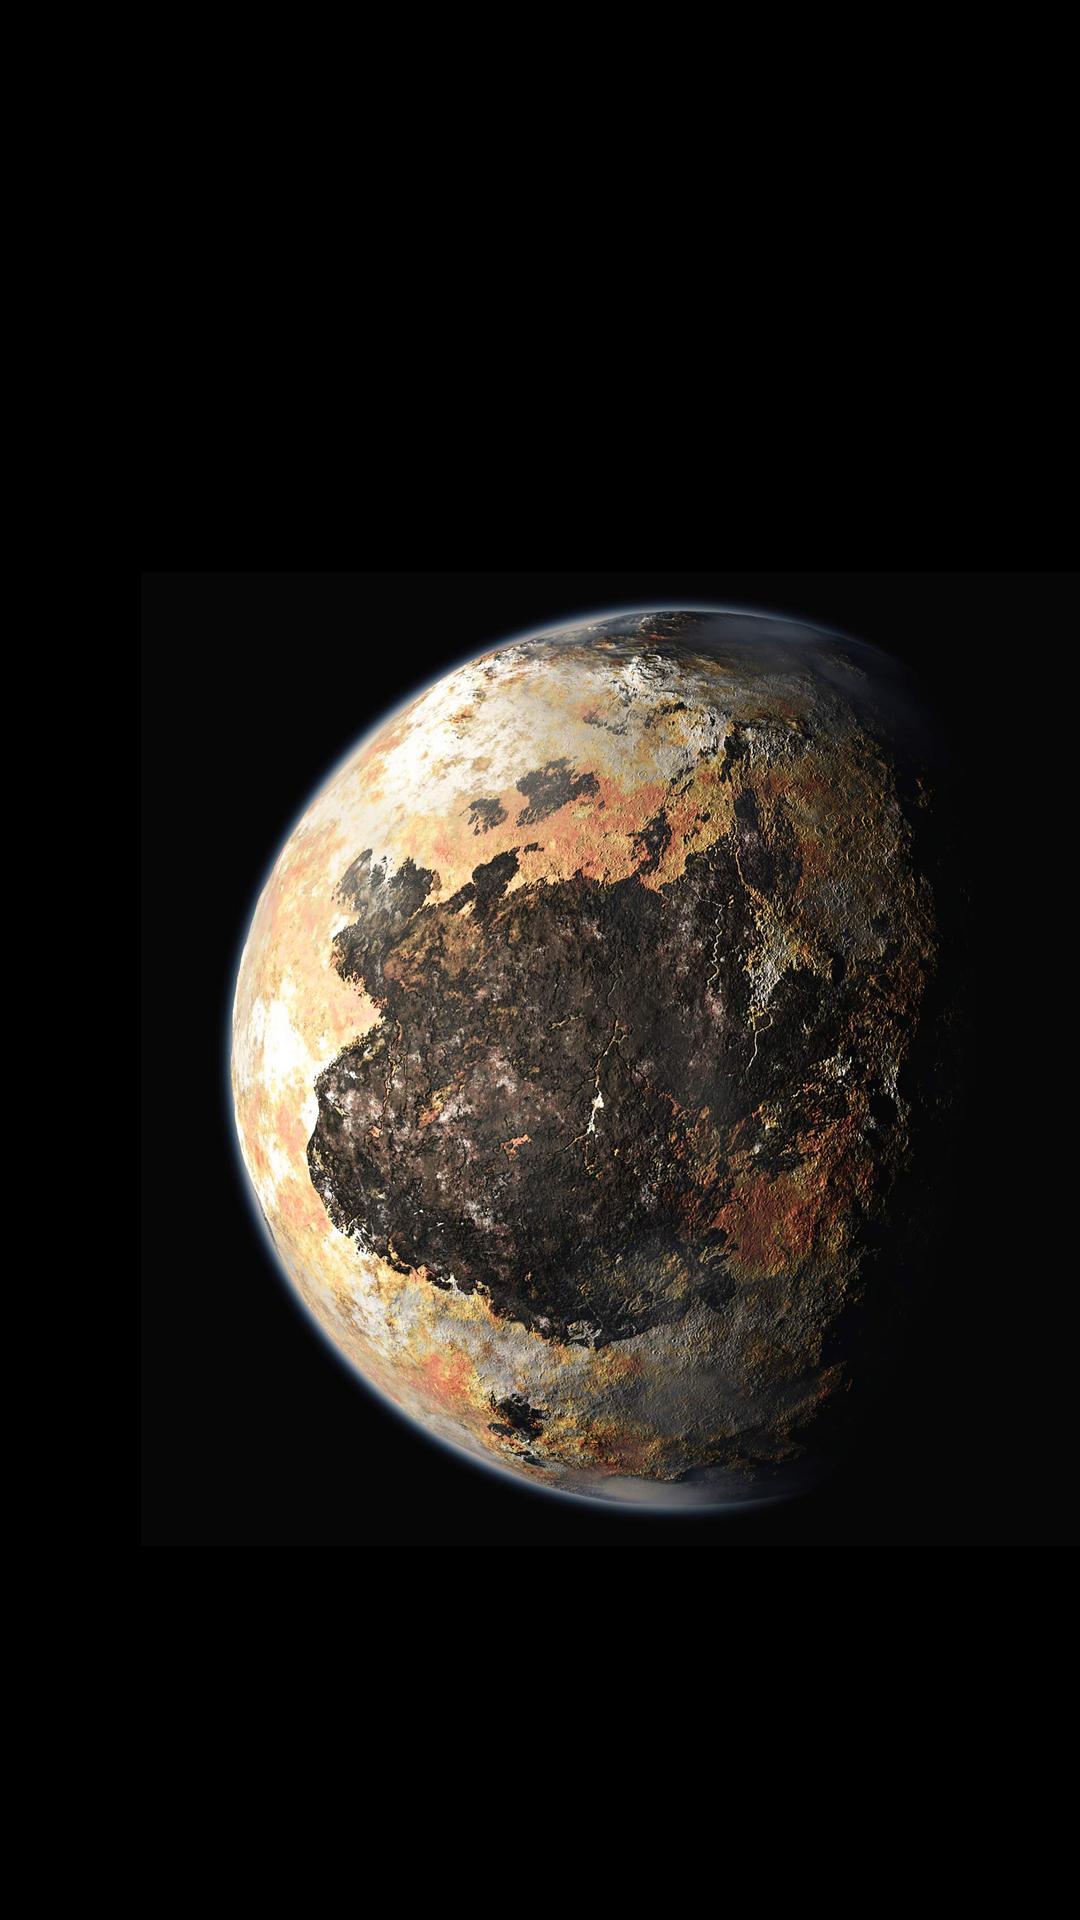 3d Earth Wallpaper Hd Pluto New Horizon Iphone Wallpaper Hd